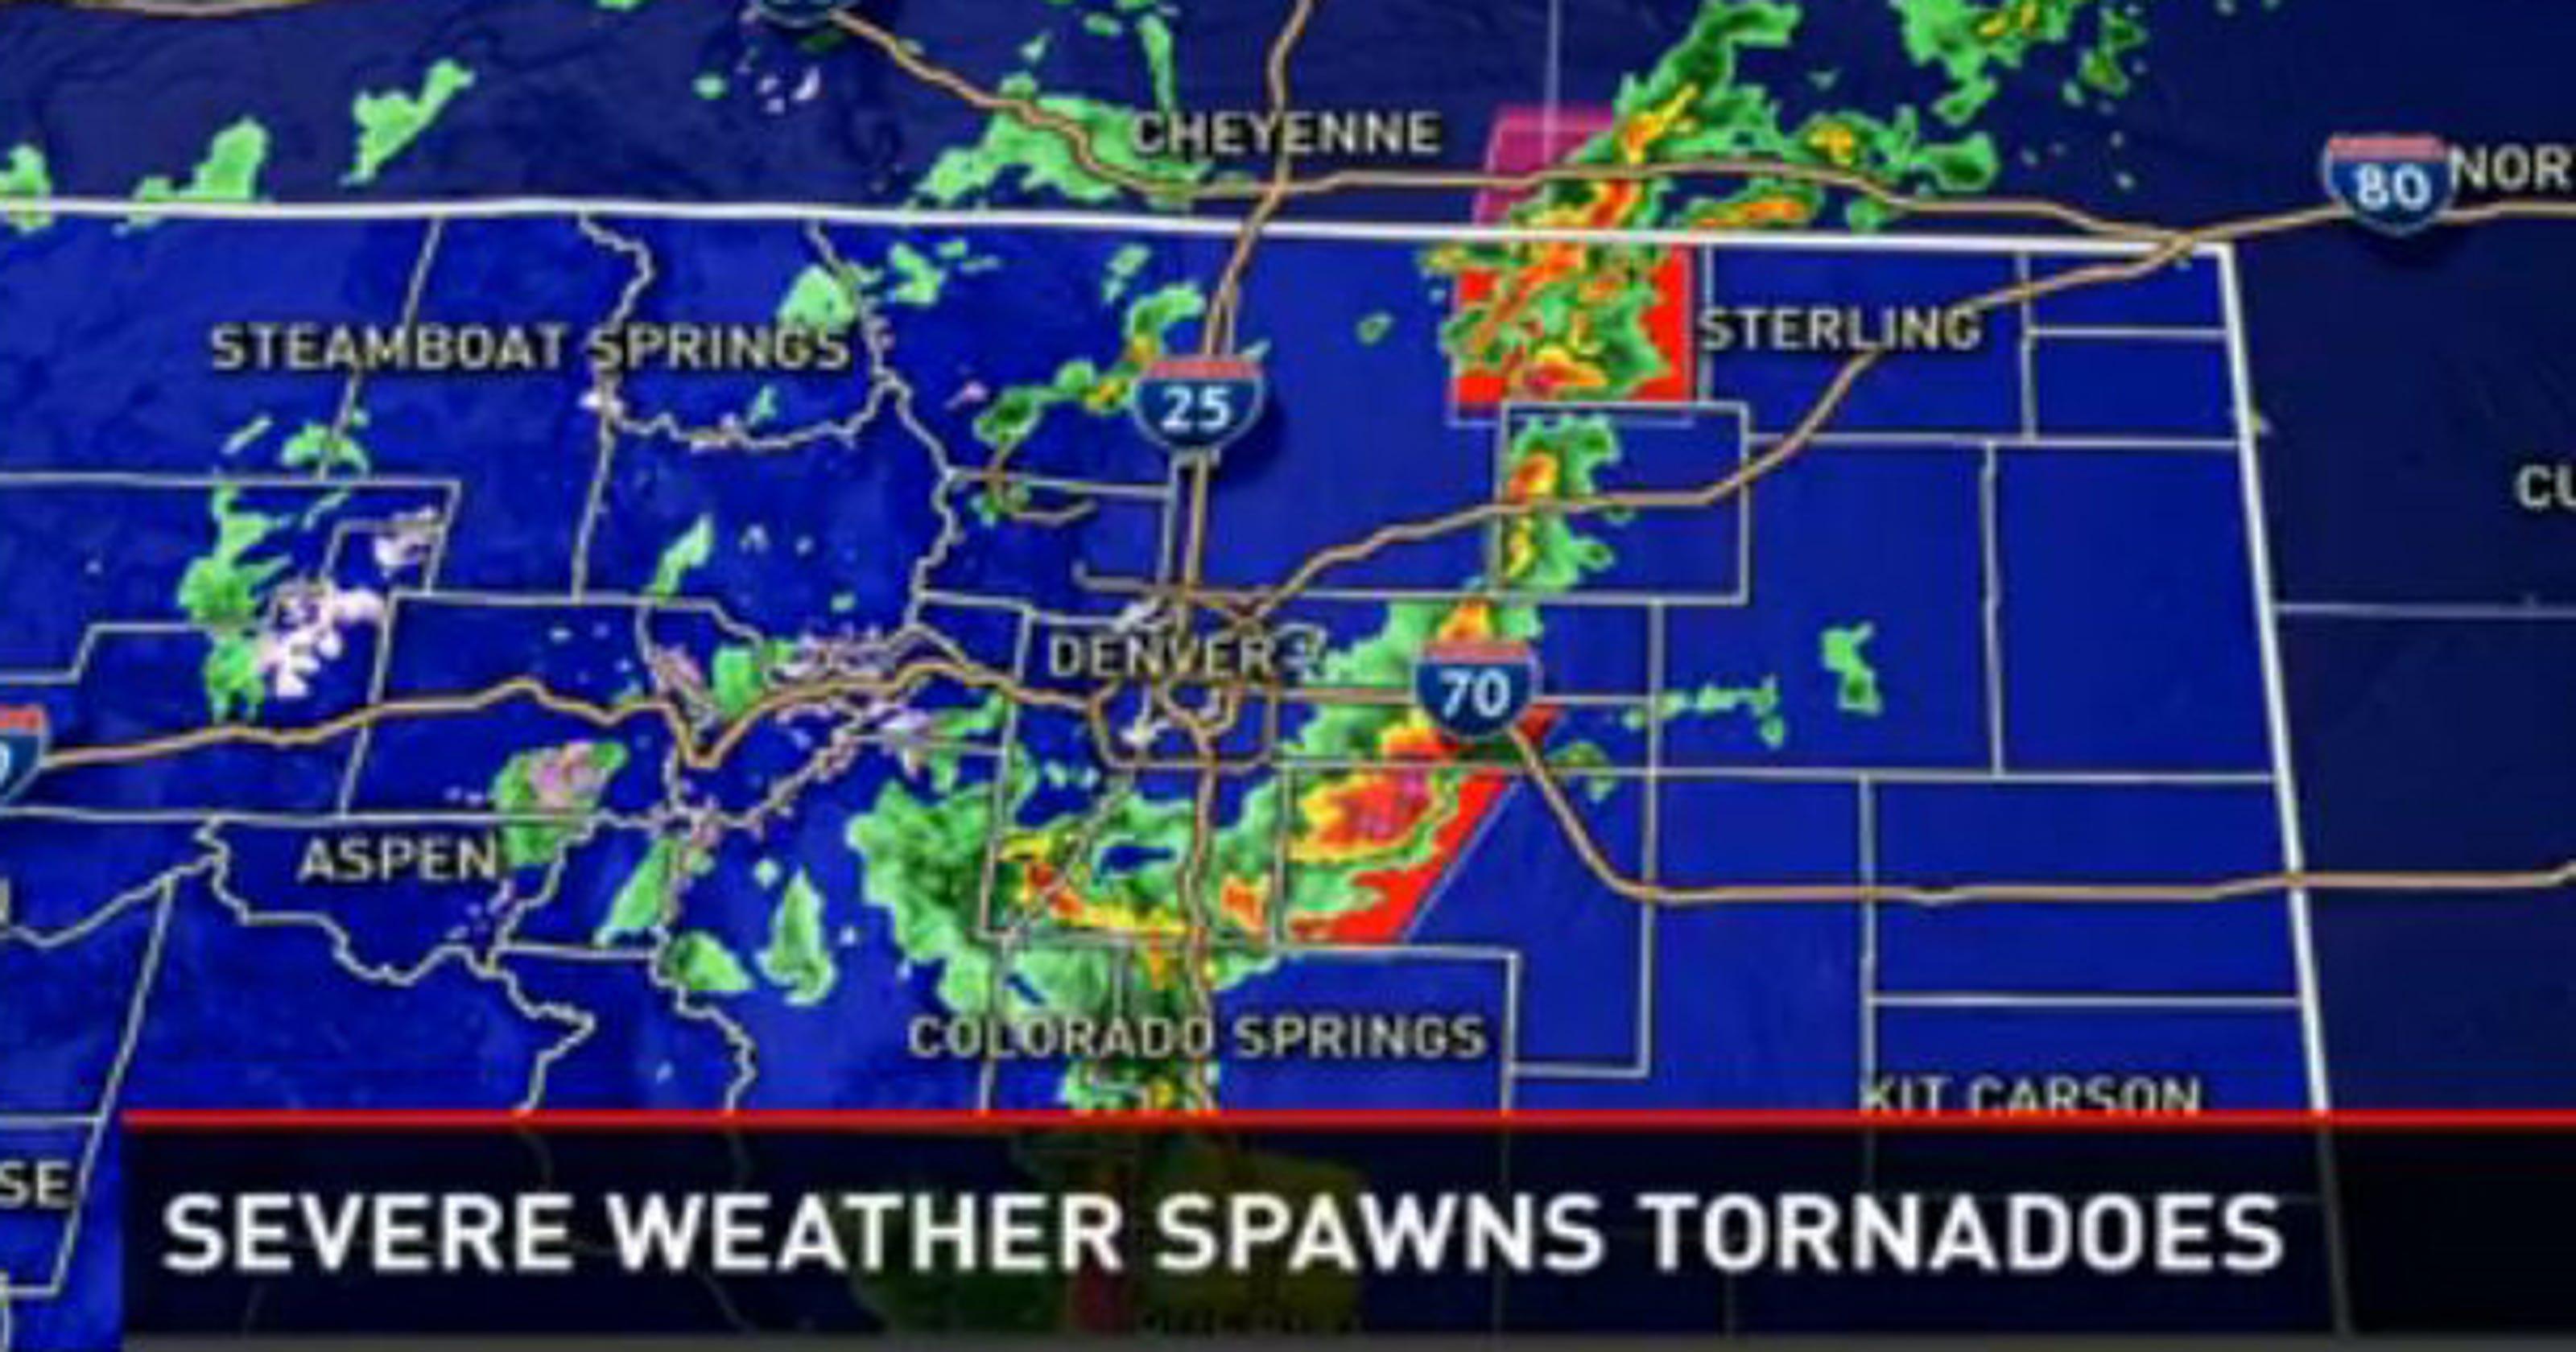 Severe Storms Spawn Tornadoes In Colorado